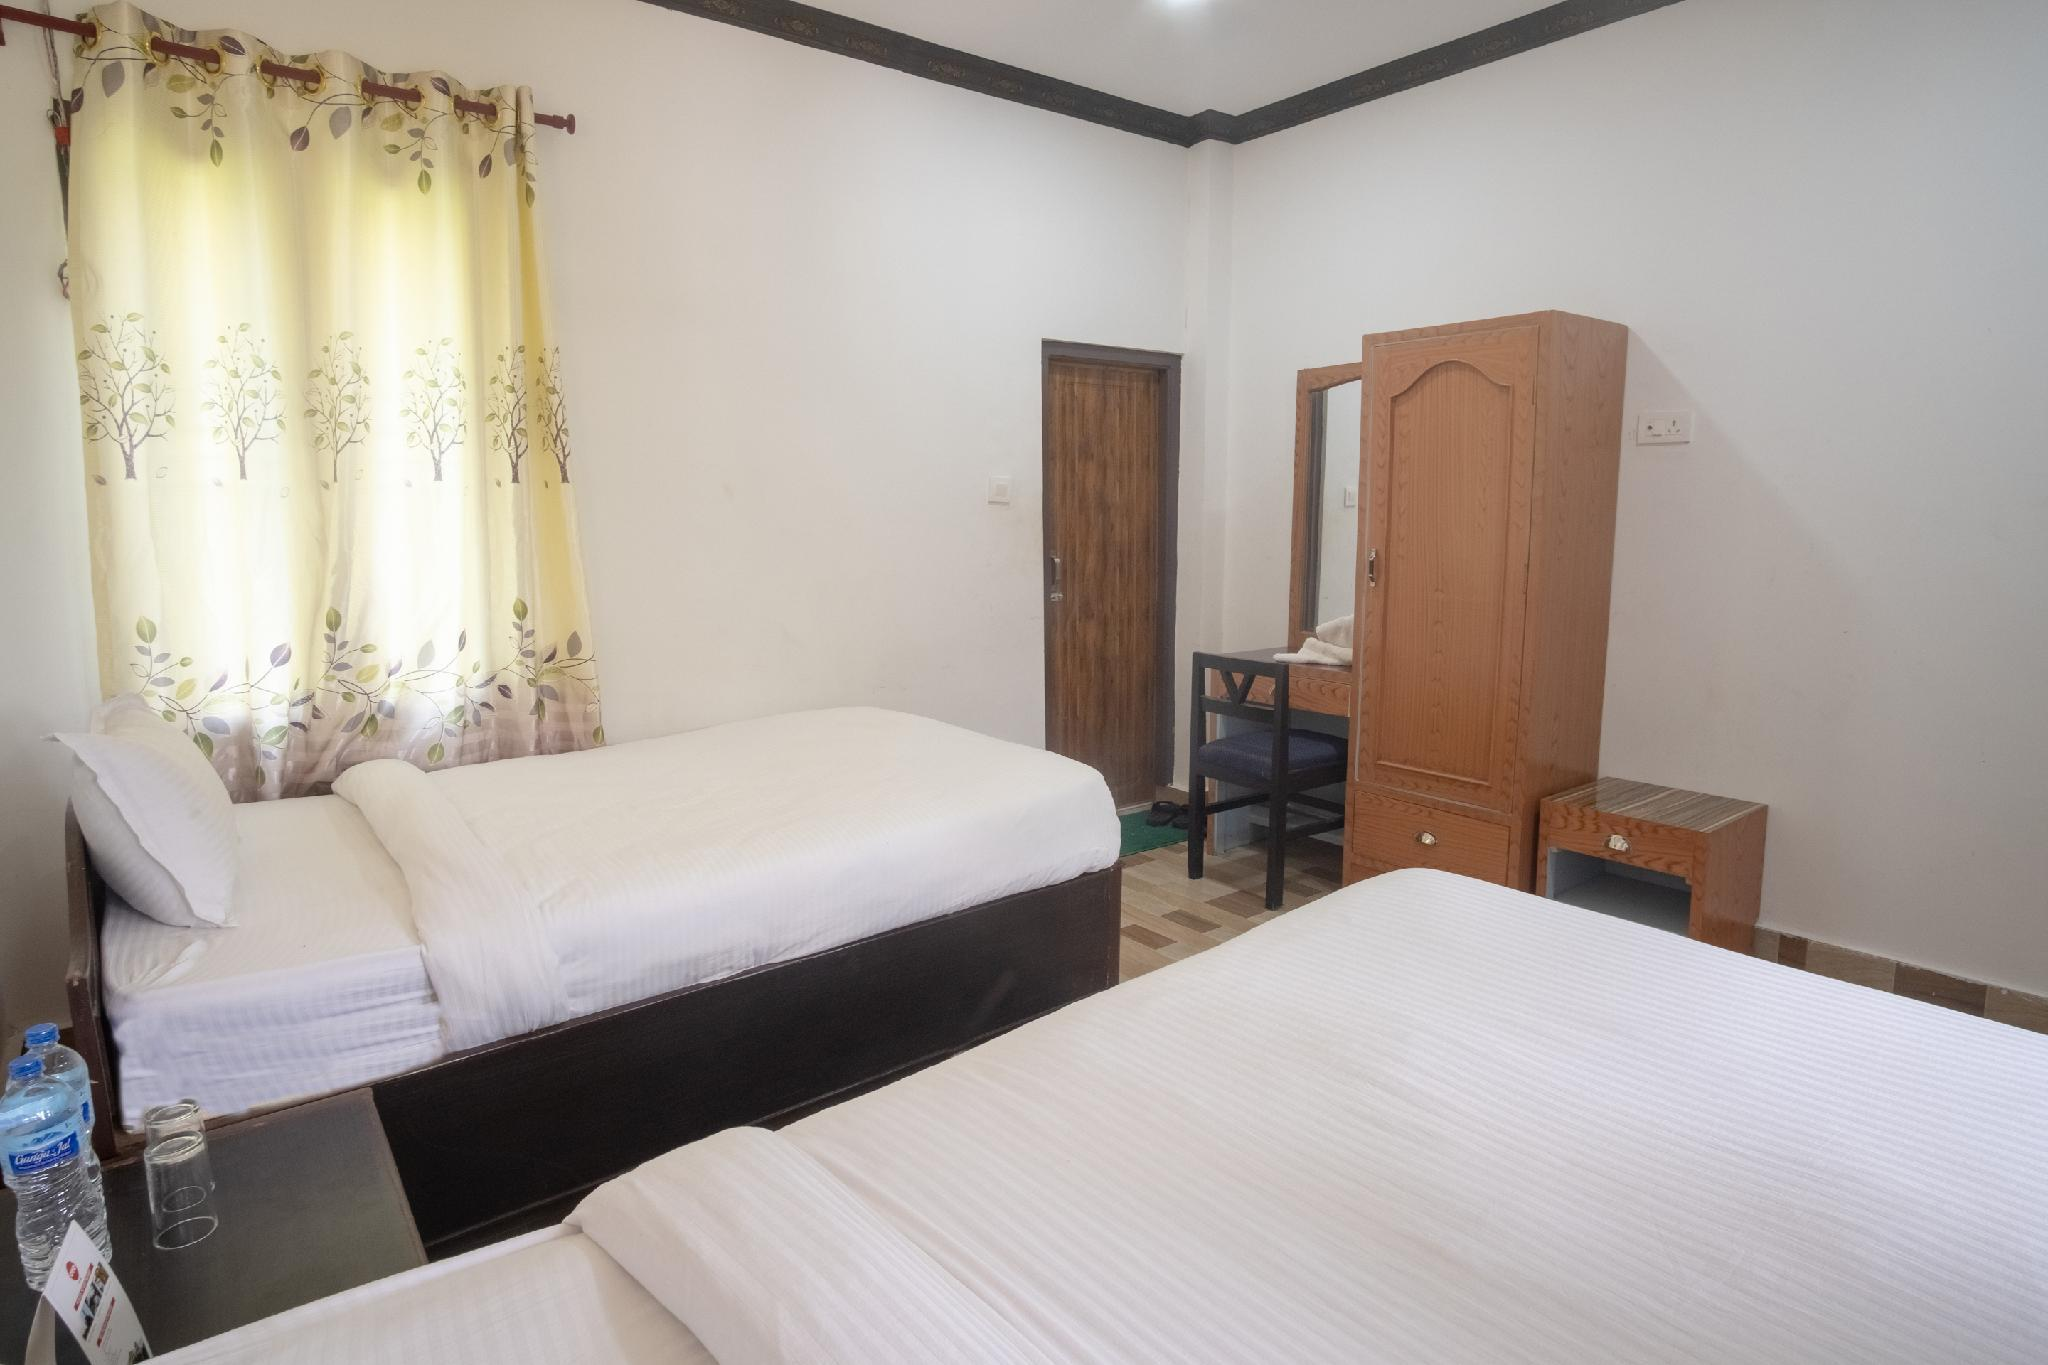 SPOT ON 437 Gairibari Resort, Narayani